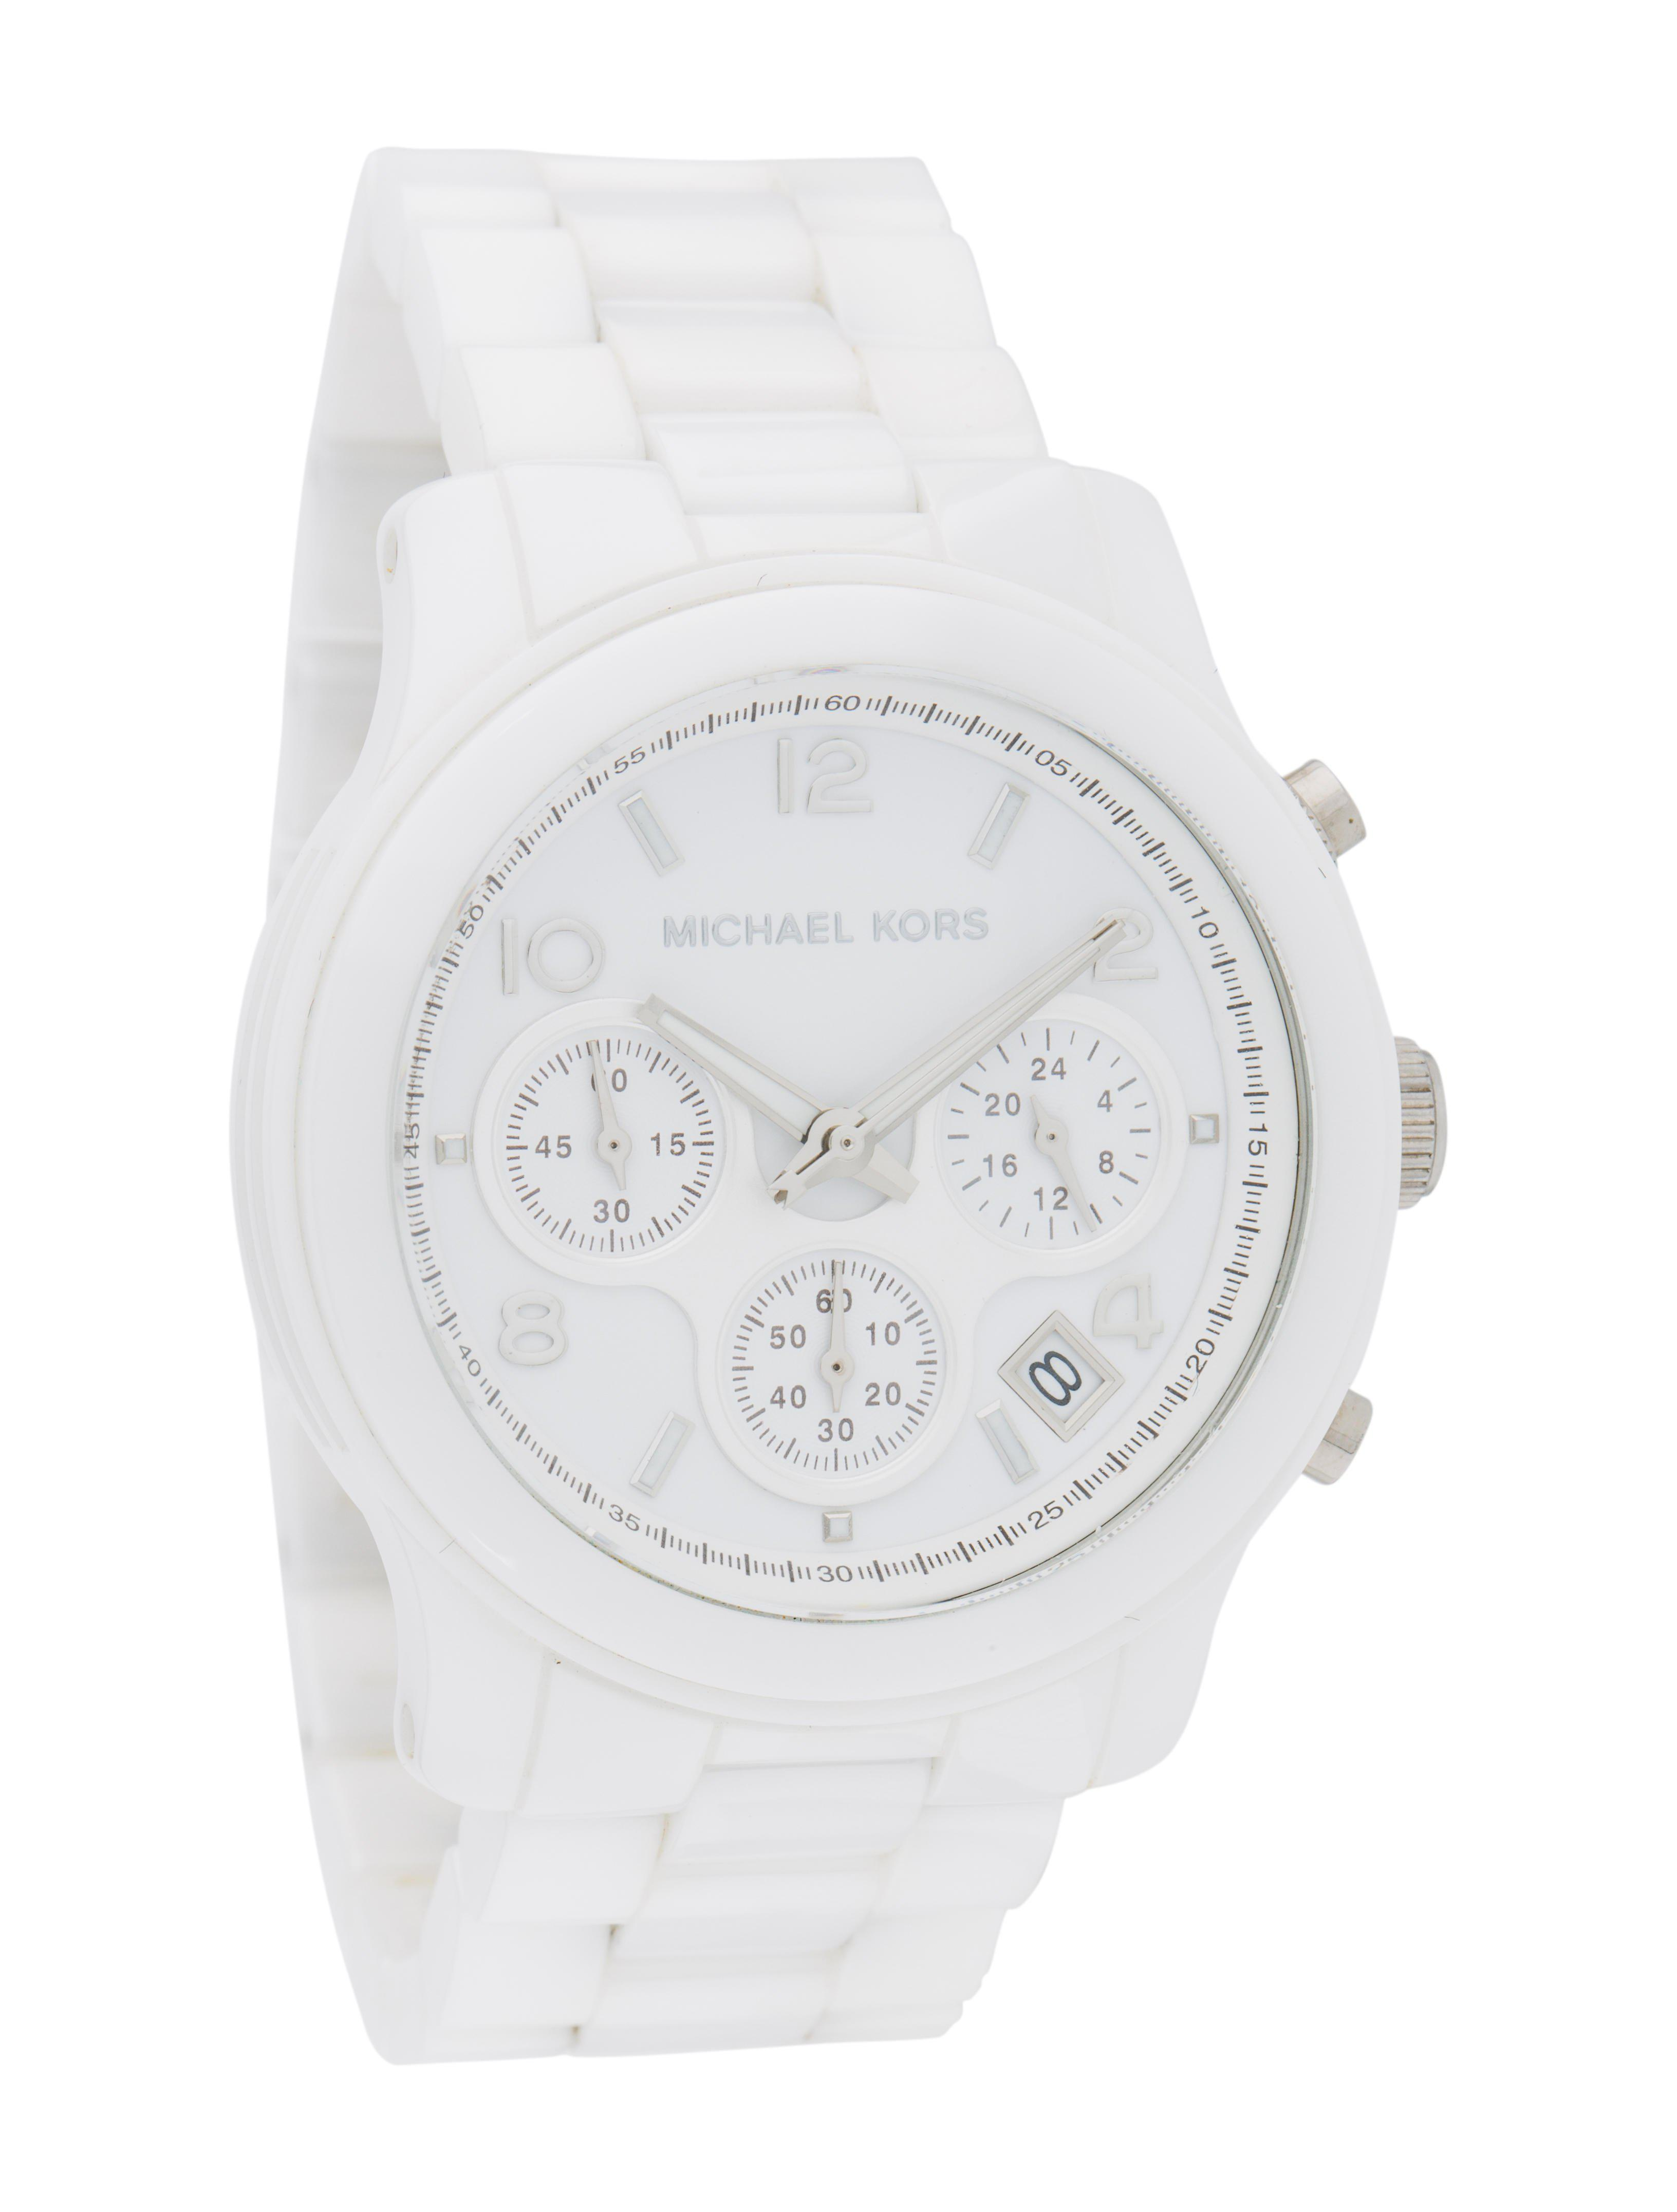 006fb5a9542b Michael Kors - Metallic Runway Watch White - Lyst. View fullscreen